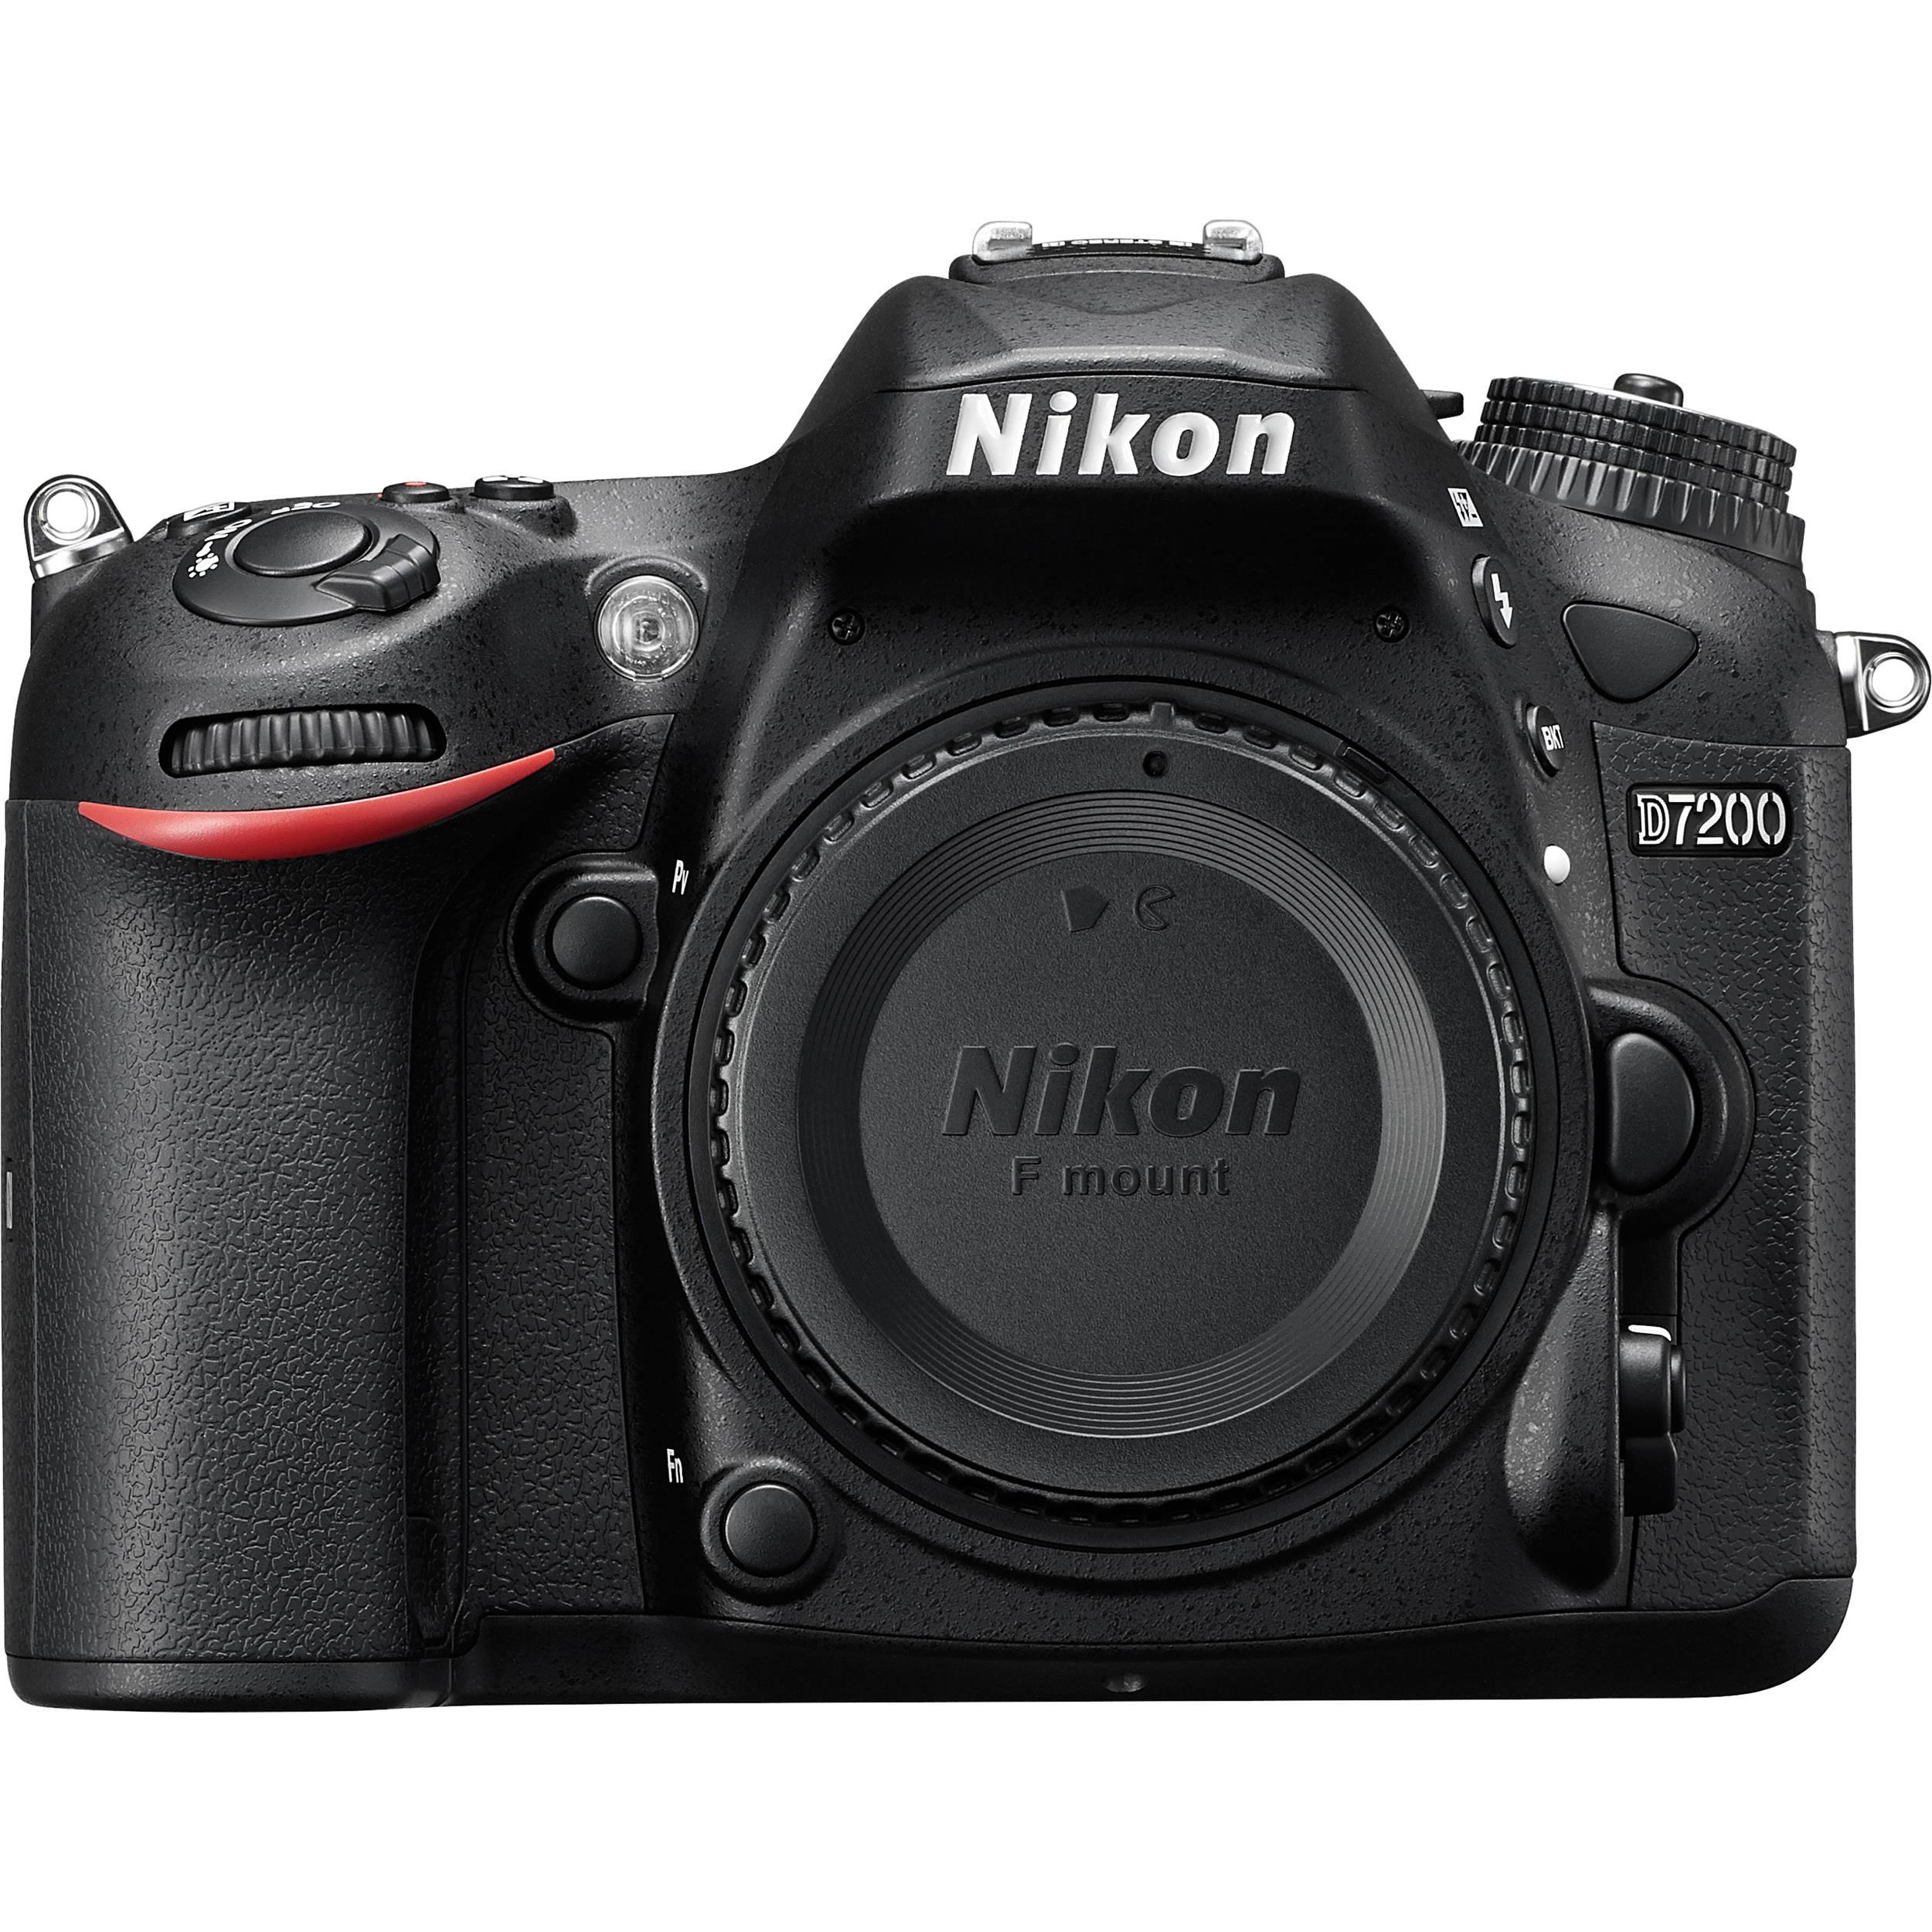 UK SHIP Brand New Nikon D7200 DSLR Body 24.2MP Full HD